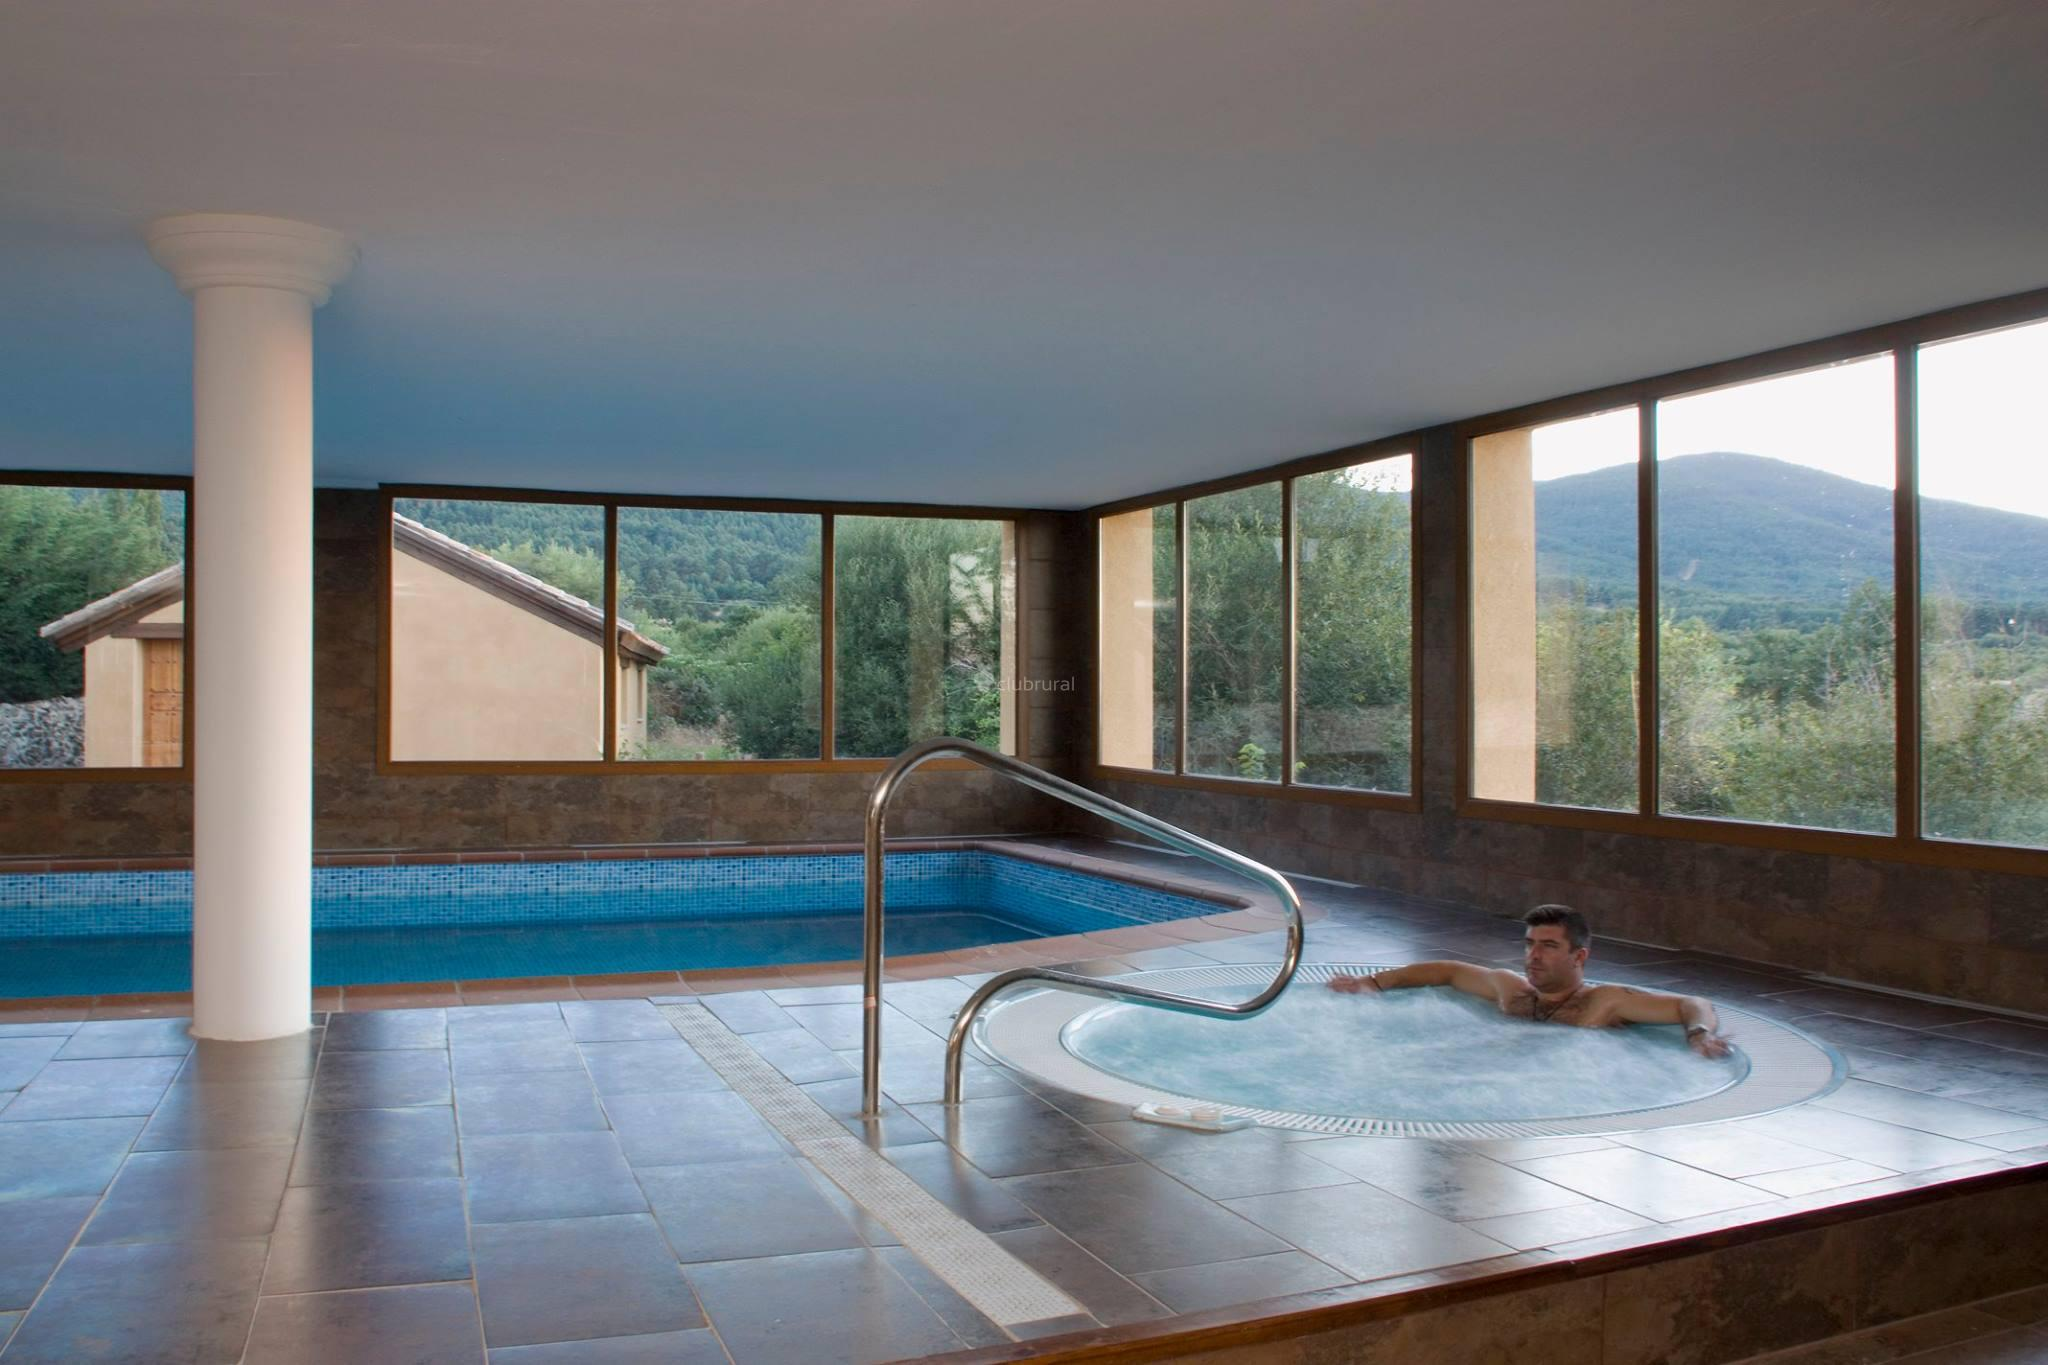 Fotos de Manantial Del Chorro  SPA  Segovia  Navafria  Clubrural